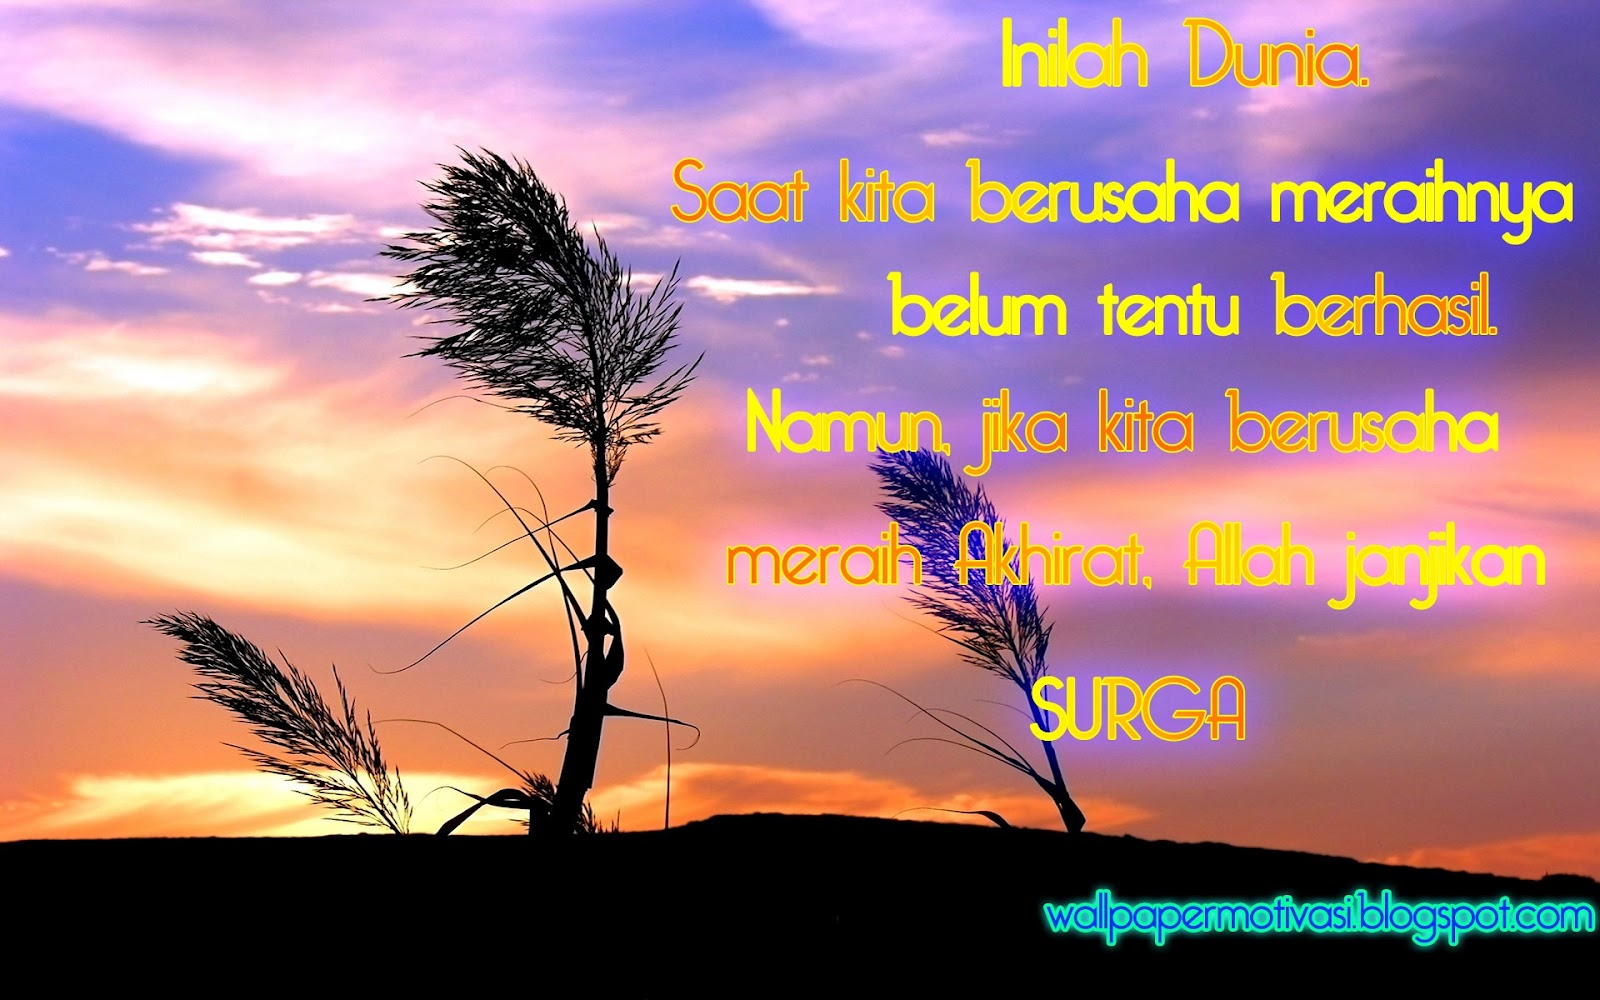 http://3.bp.blogspot.com/-9f57h_Psn7c/UFB8PUITaII/AAAAAAAAARk/yXxXyAw3jxg/s1600/kata+mutiara-kata+kata+bijak-kata+kata+indah-Allah+janjikan+surga.jpg